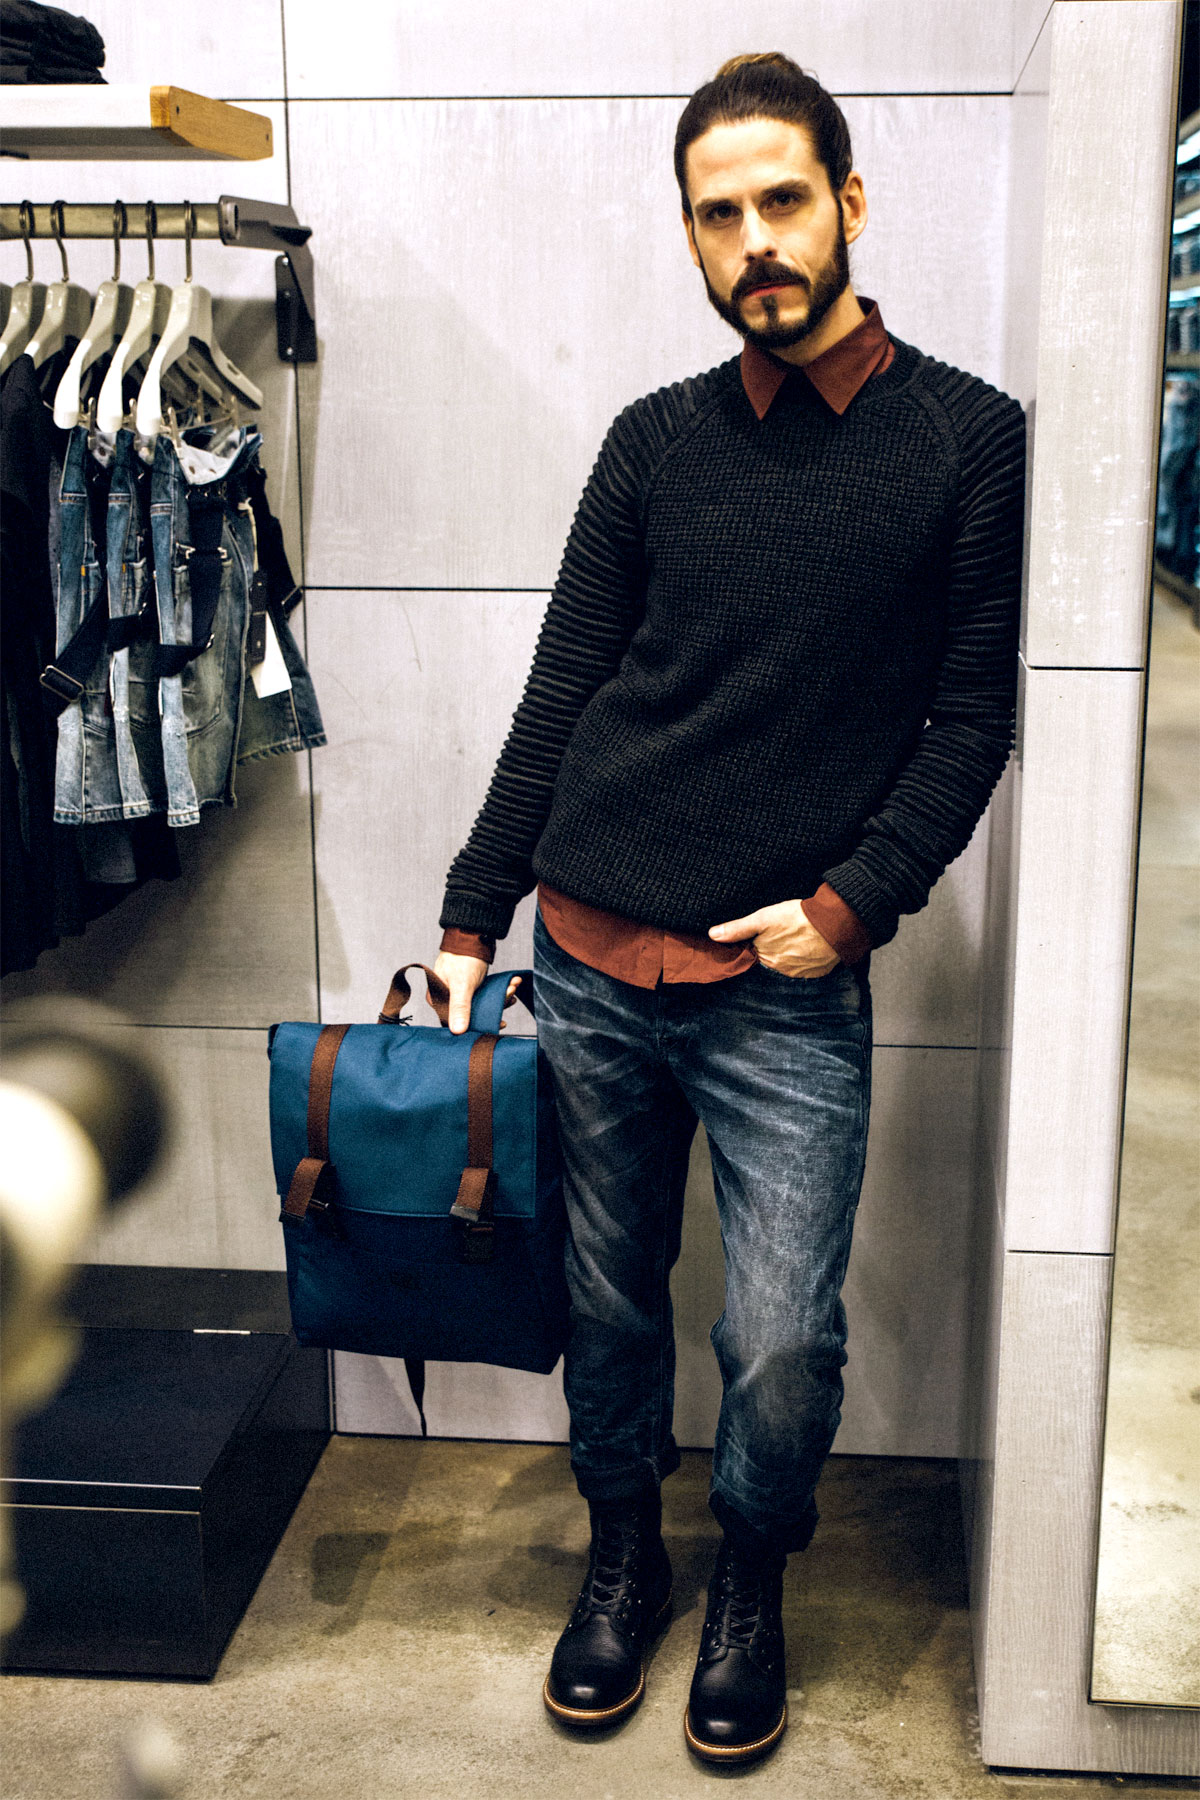 editorial-g-star-raw-kollektion-jeans-boots-jacke-malefashion-maennermodeblog